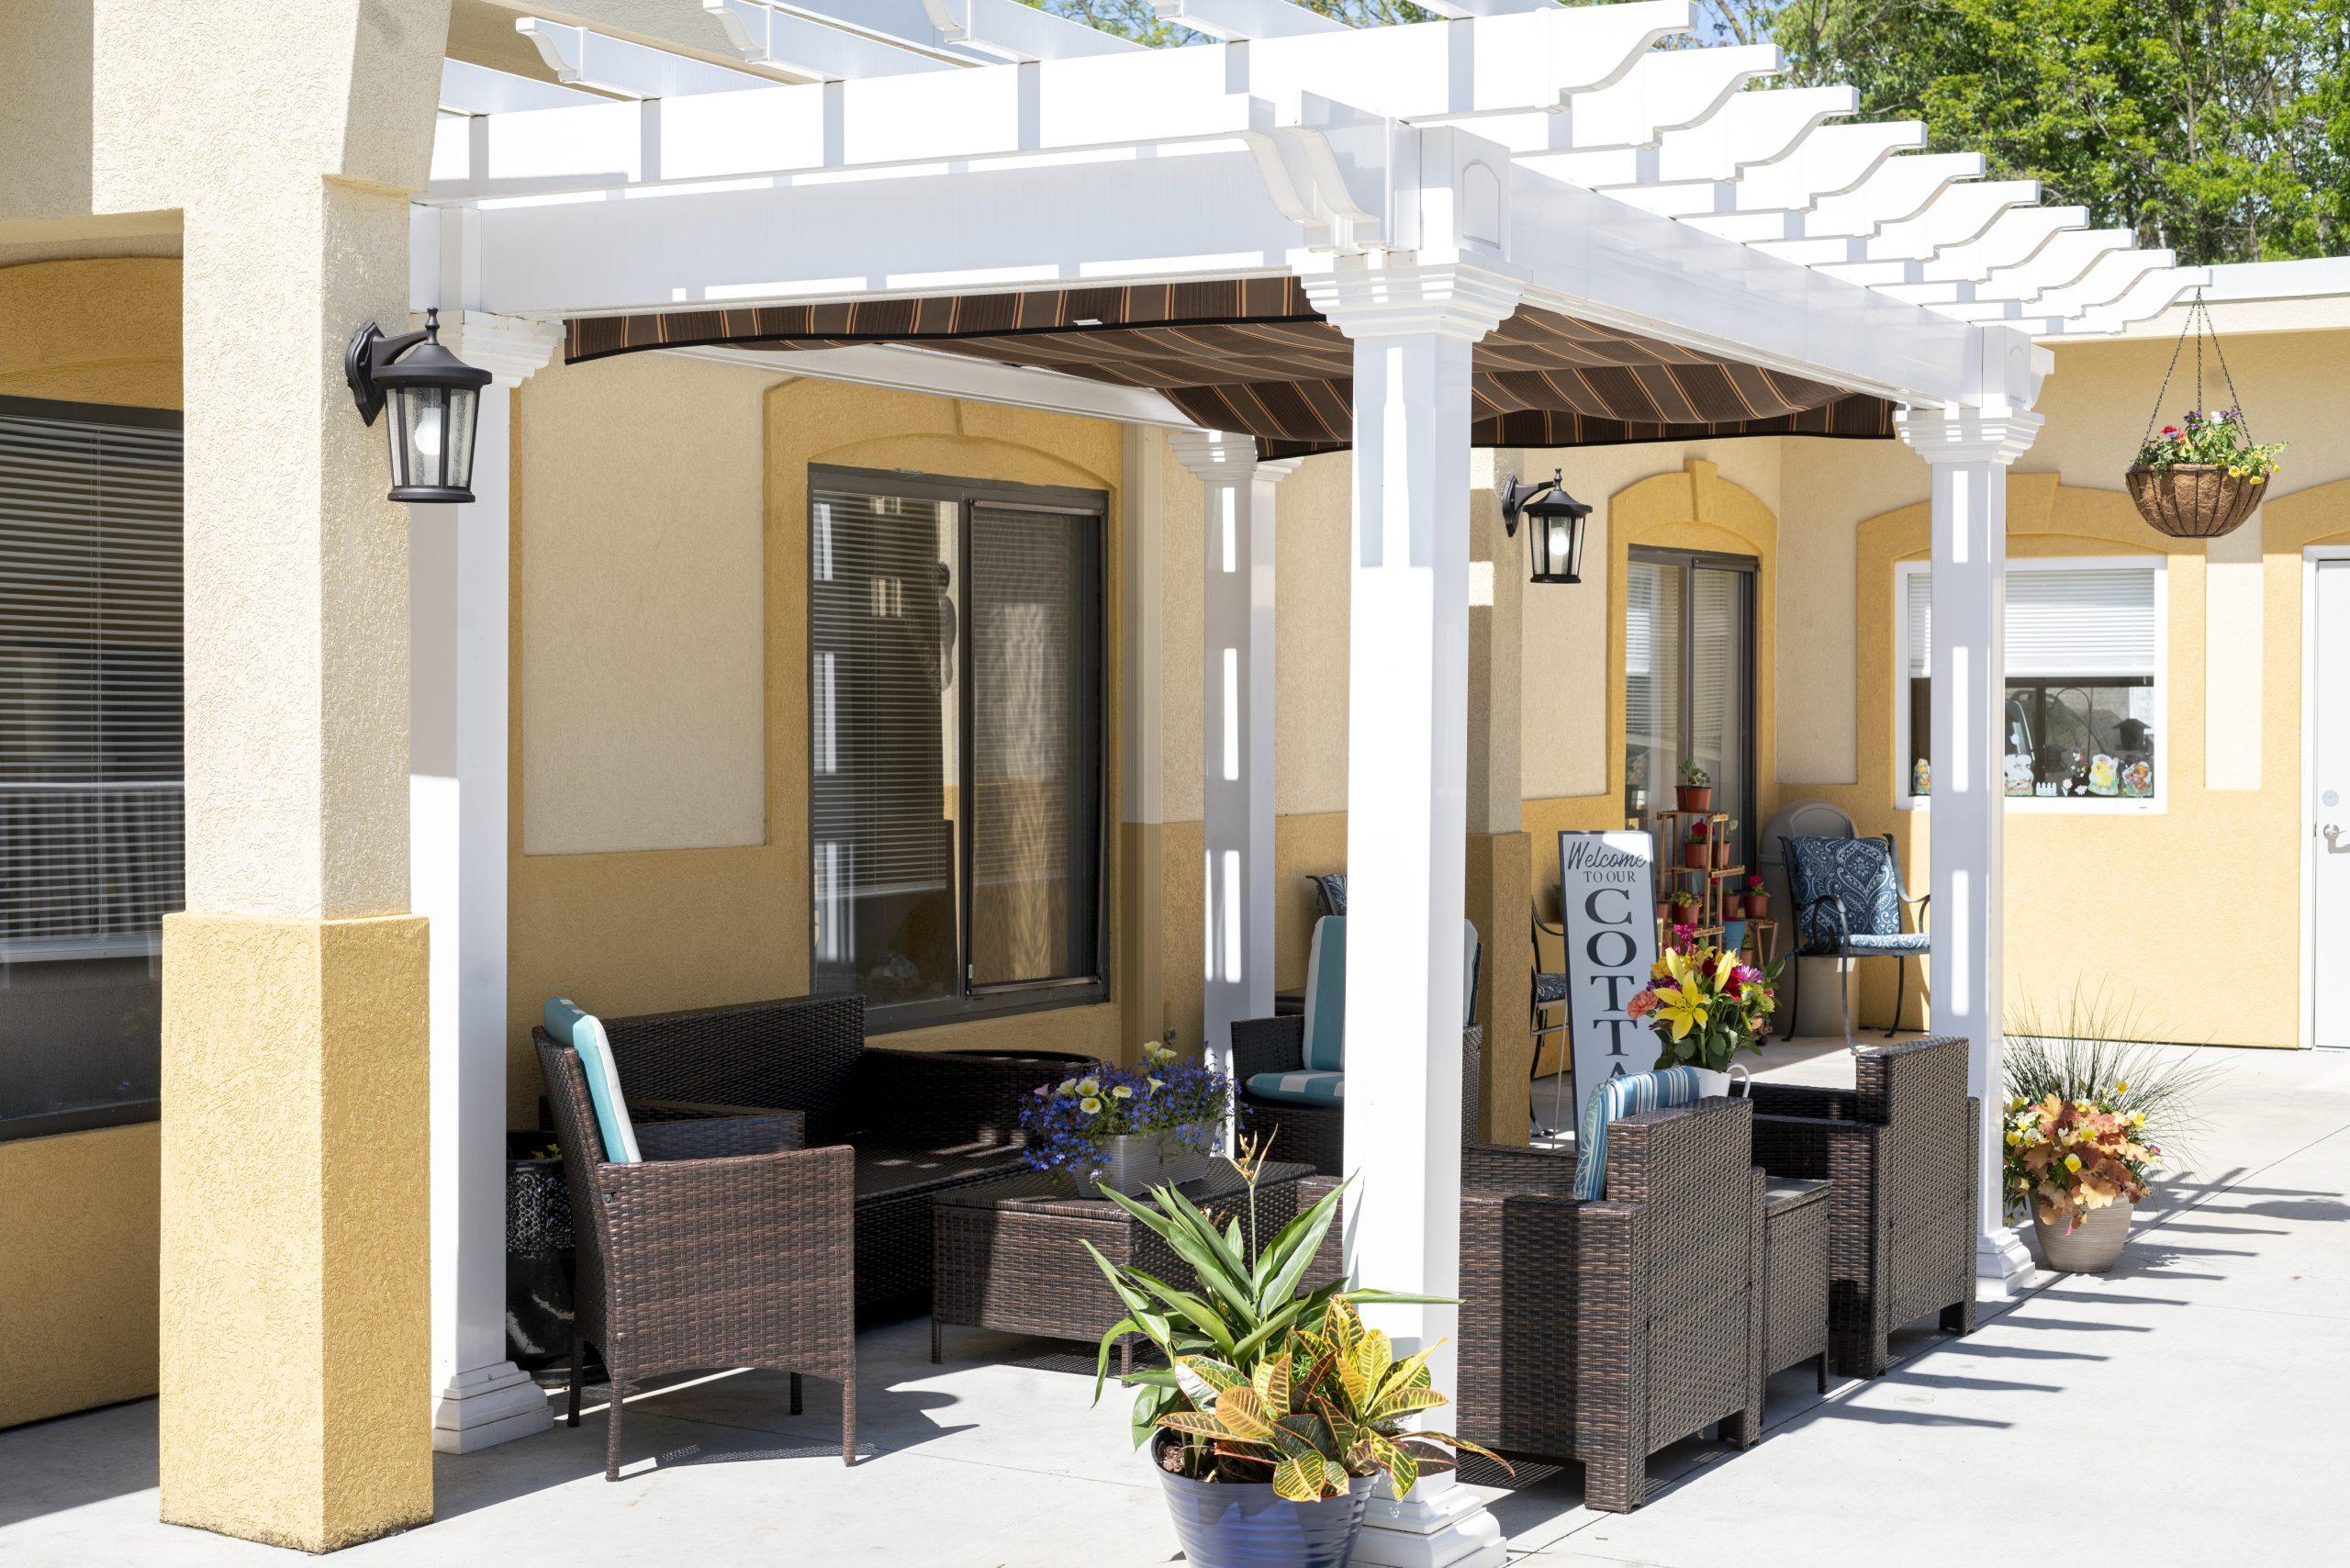 Stonerise Parkersburg patio area with seating under pergola